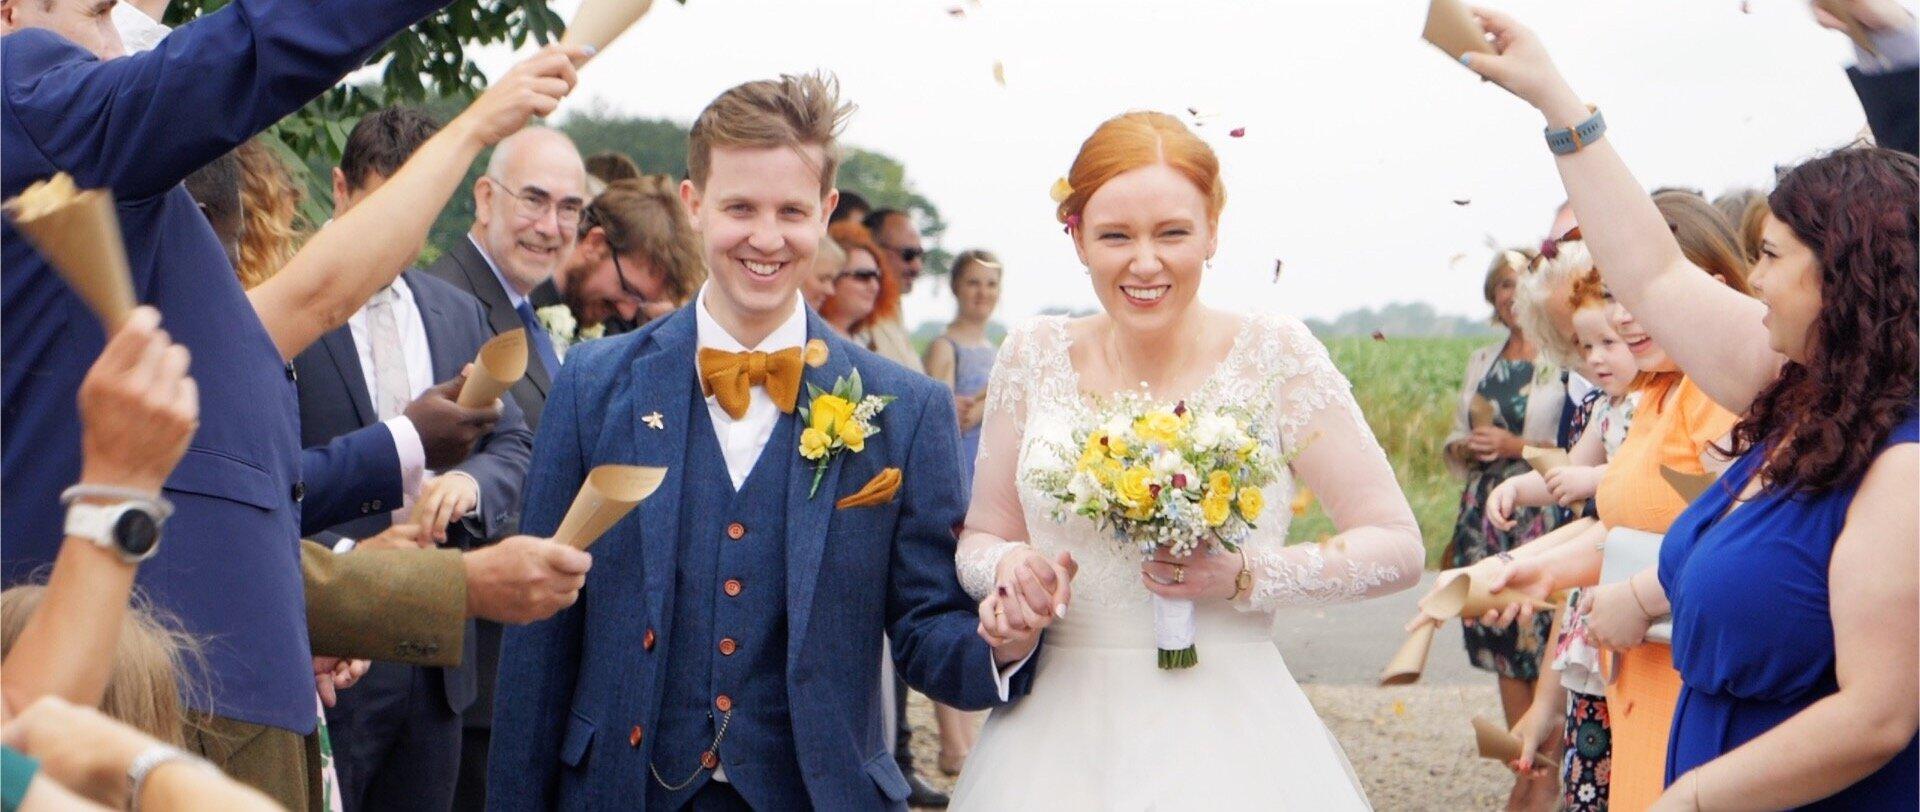 Confetti wedding video essex.jpg